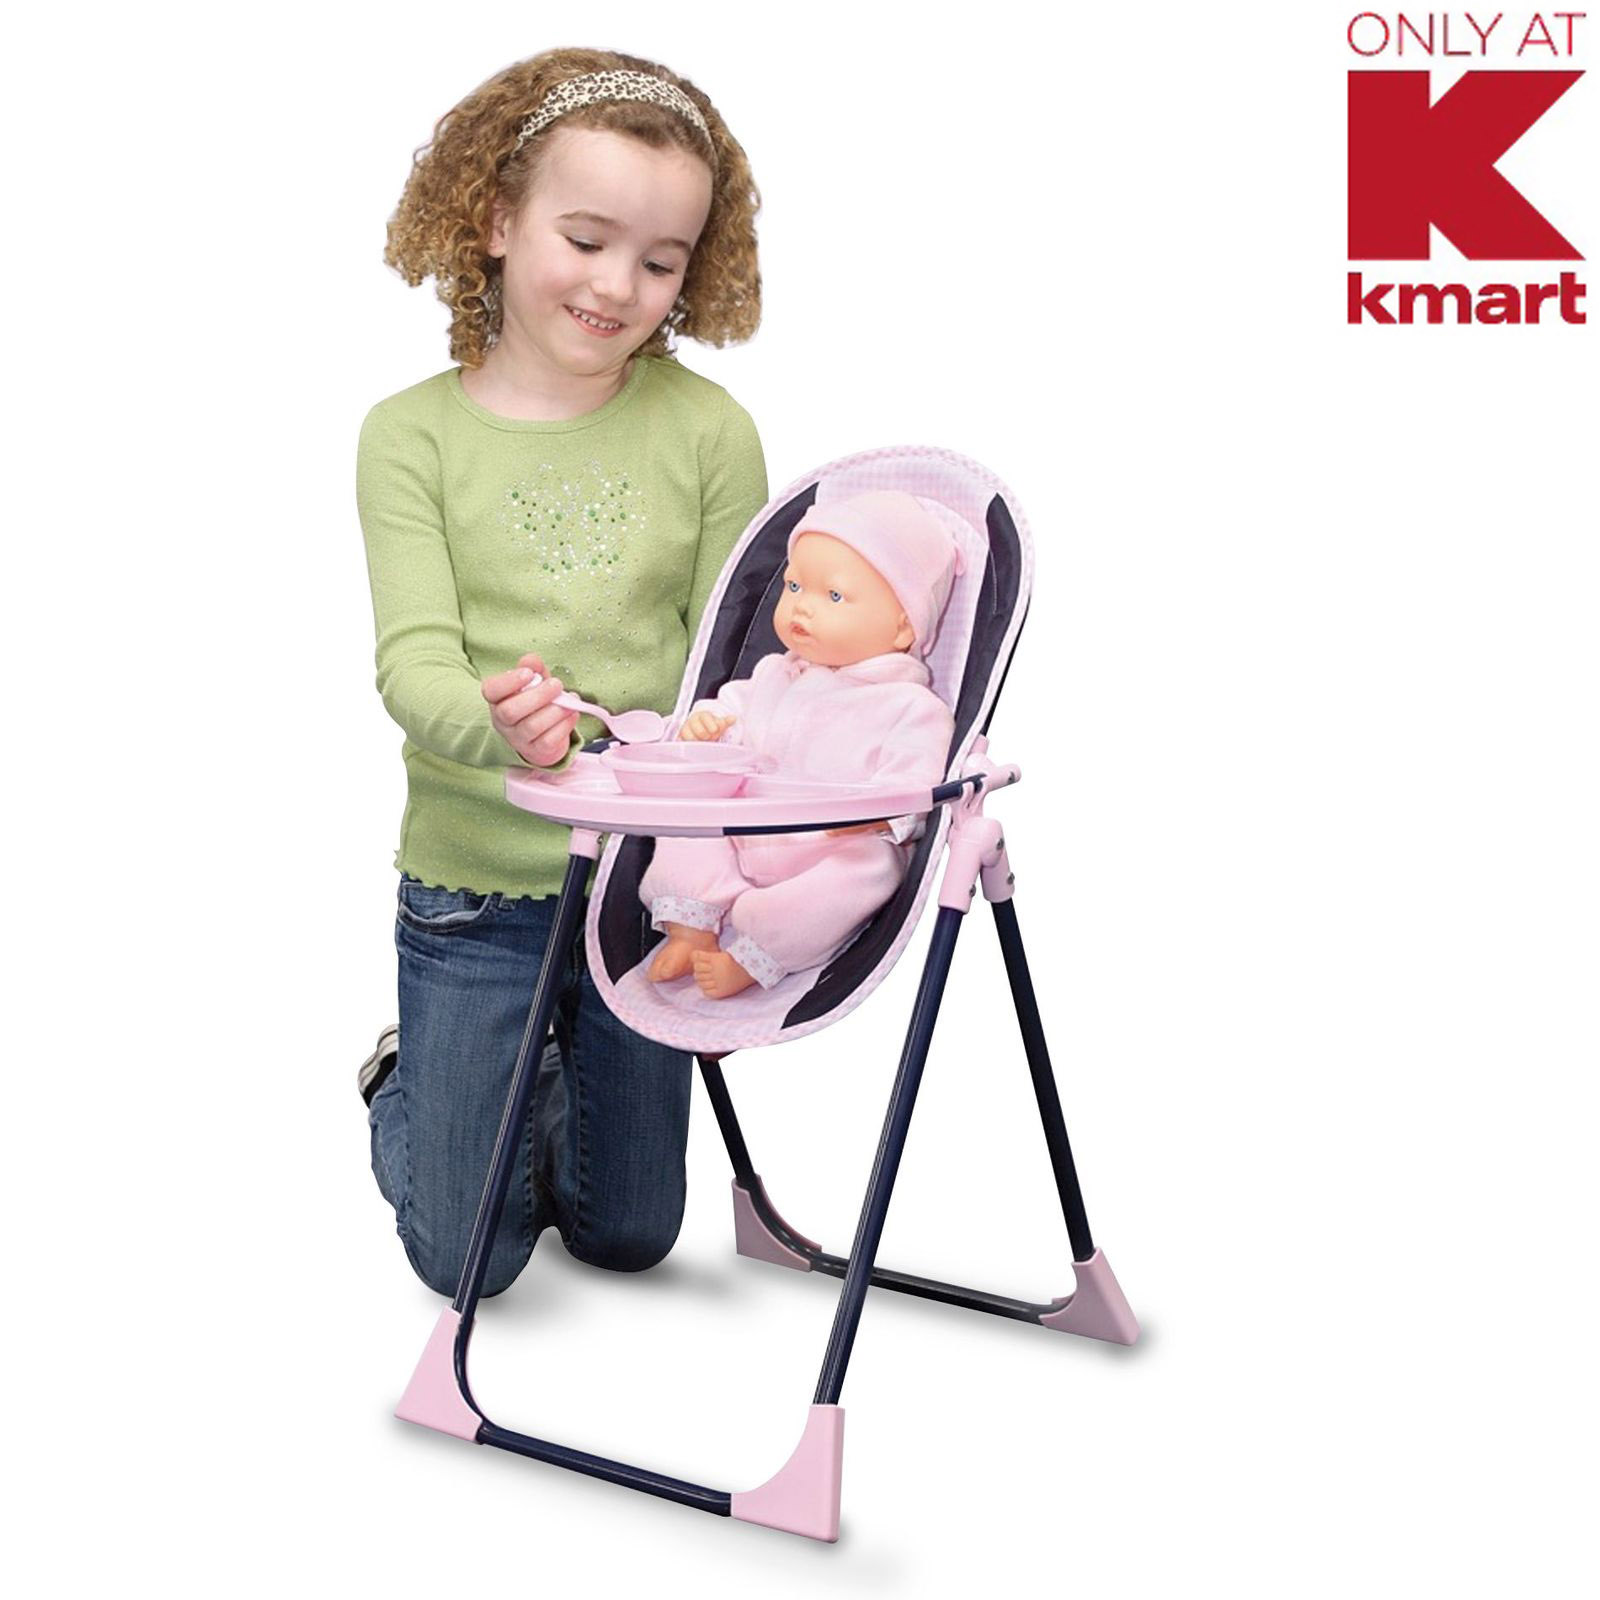 kmart baby high chairs porsche office chair k mart 3 in 1 swing combo